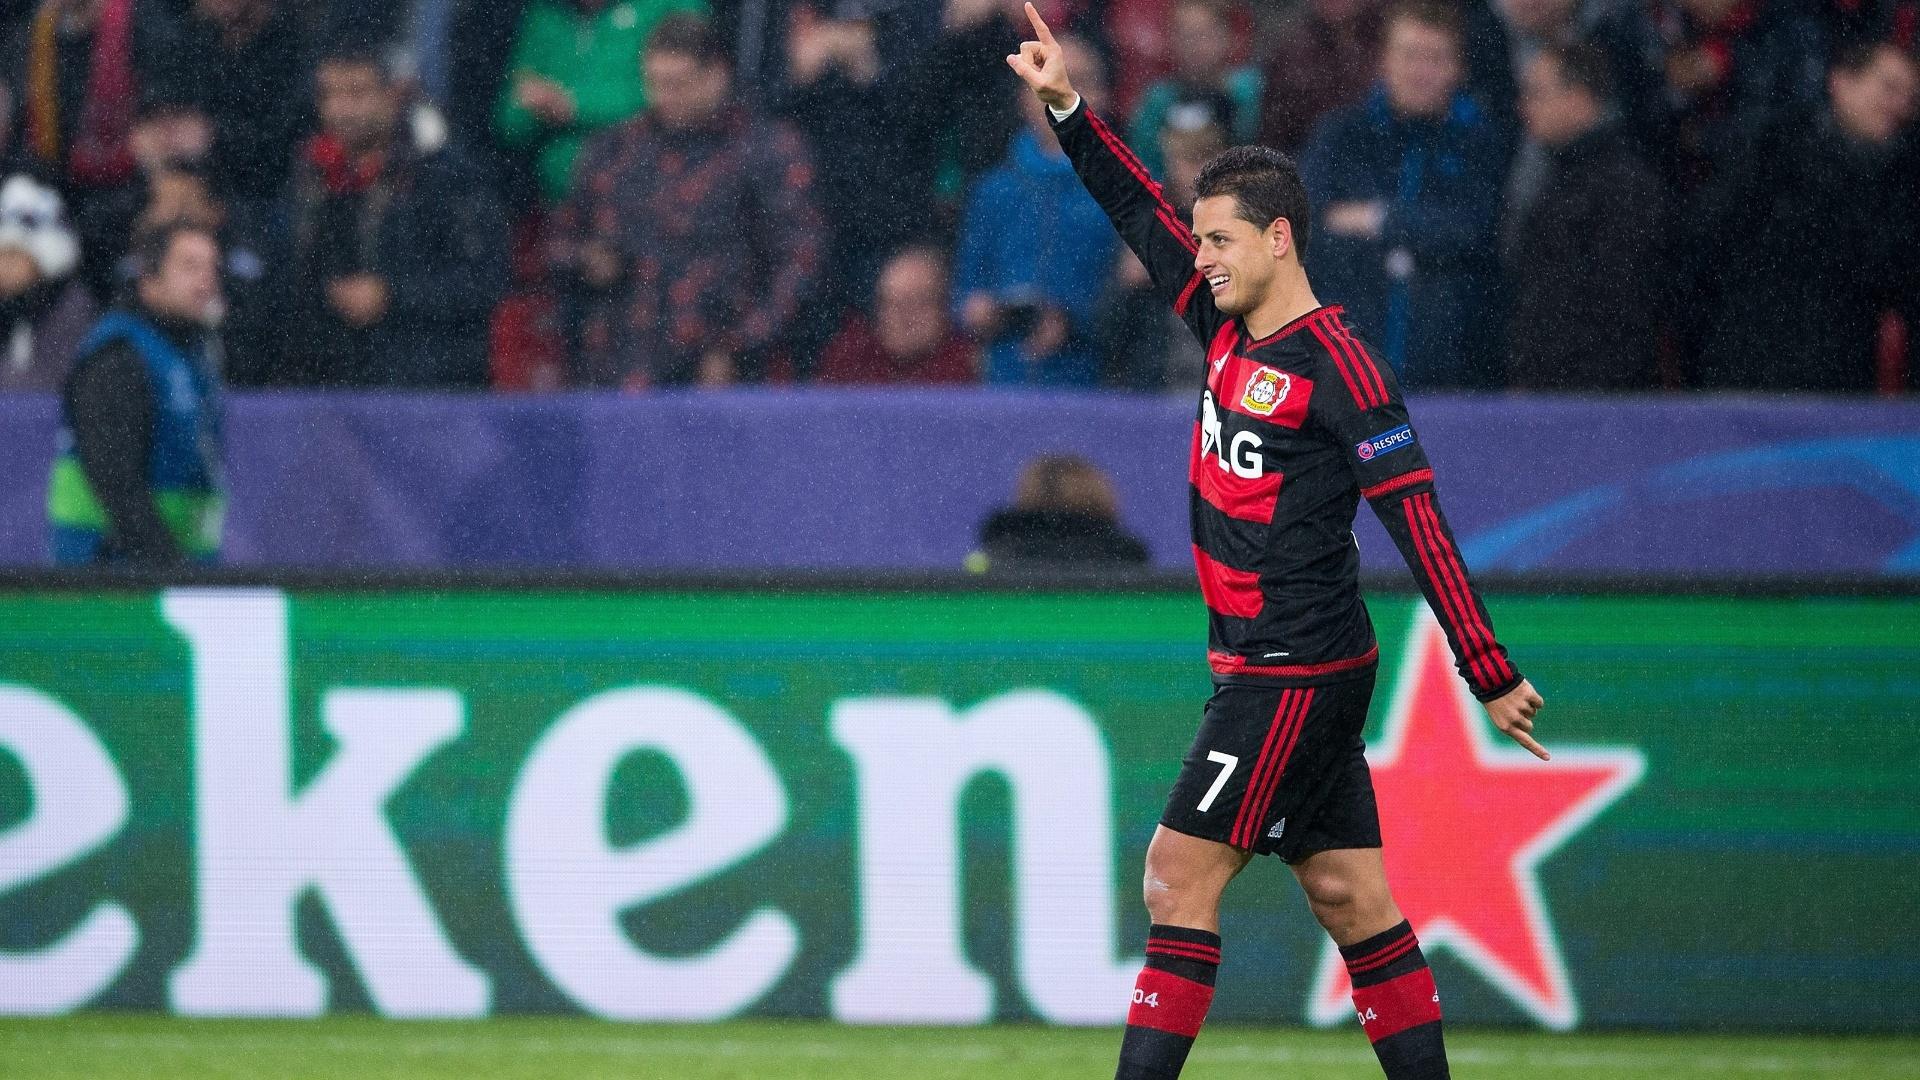 Chicharito comemora após marcar para o Bayer Leverkusen contra a Roma pela Liga dos Campeões